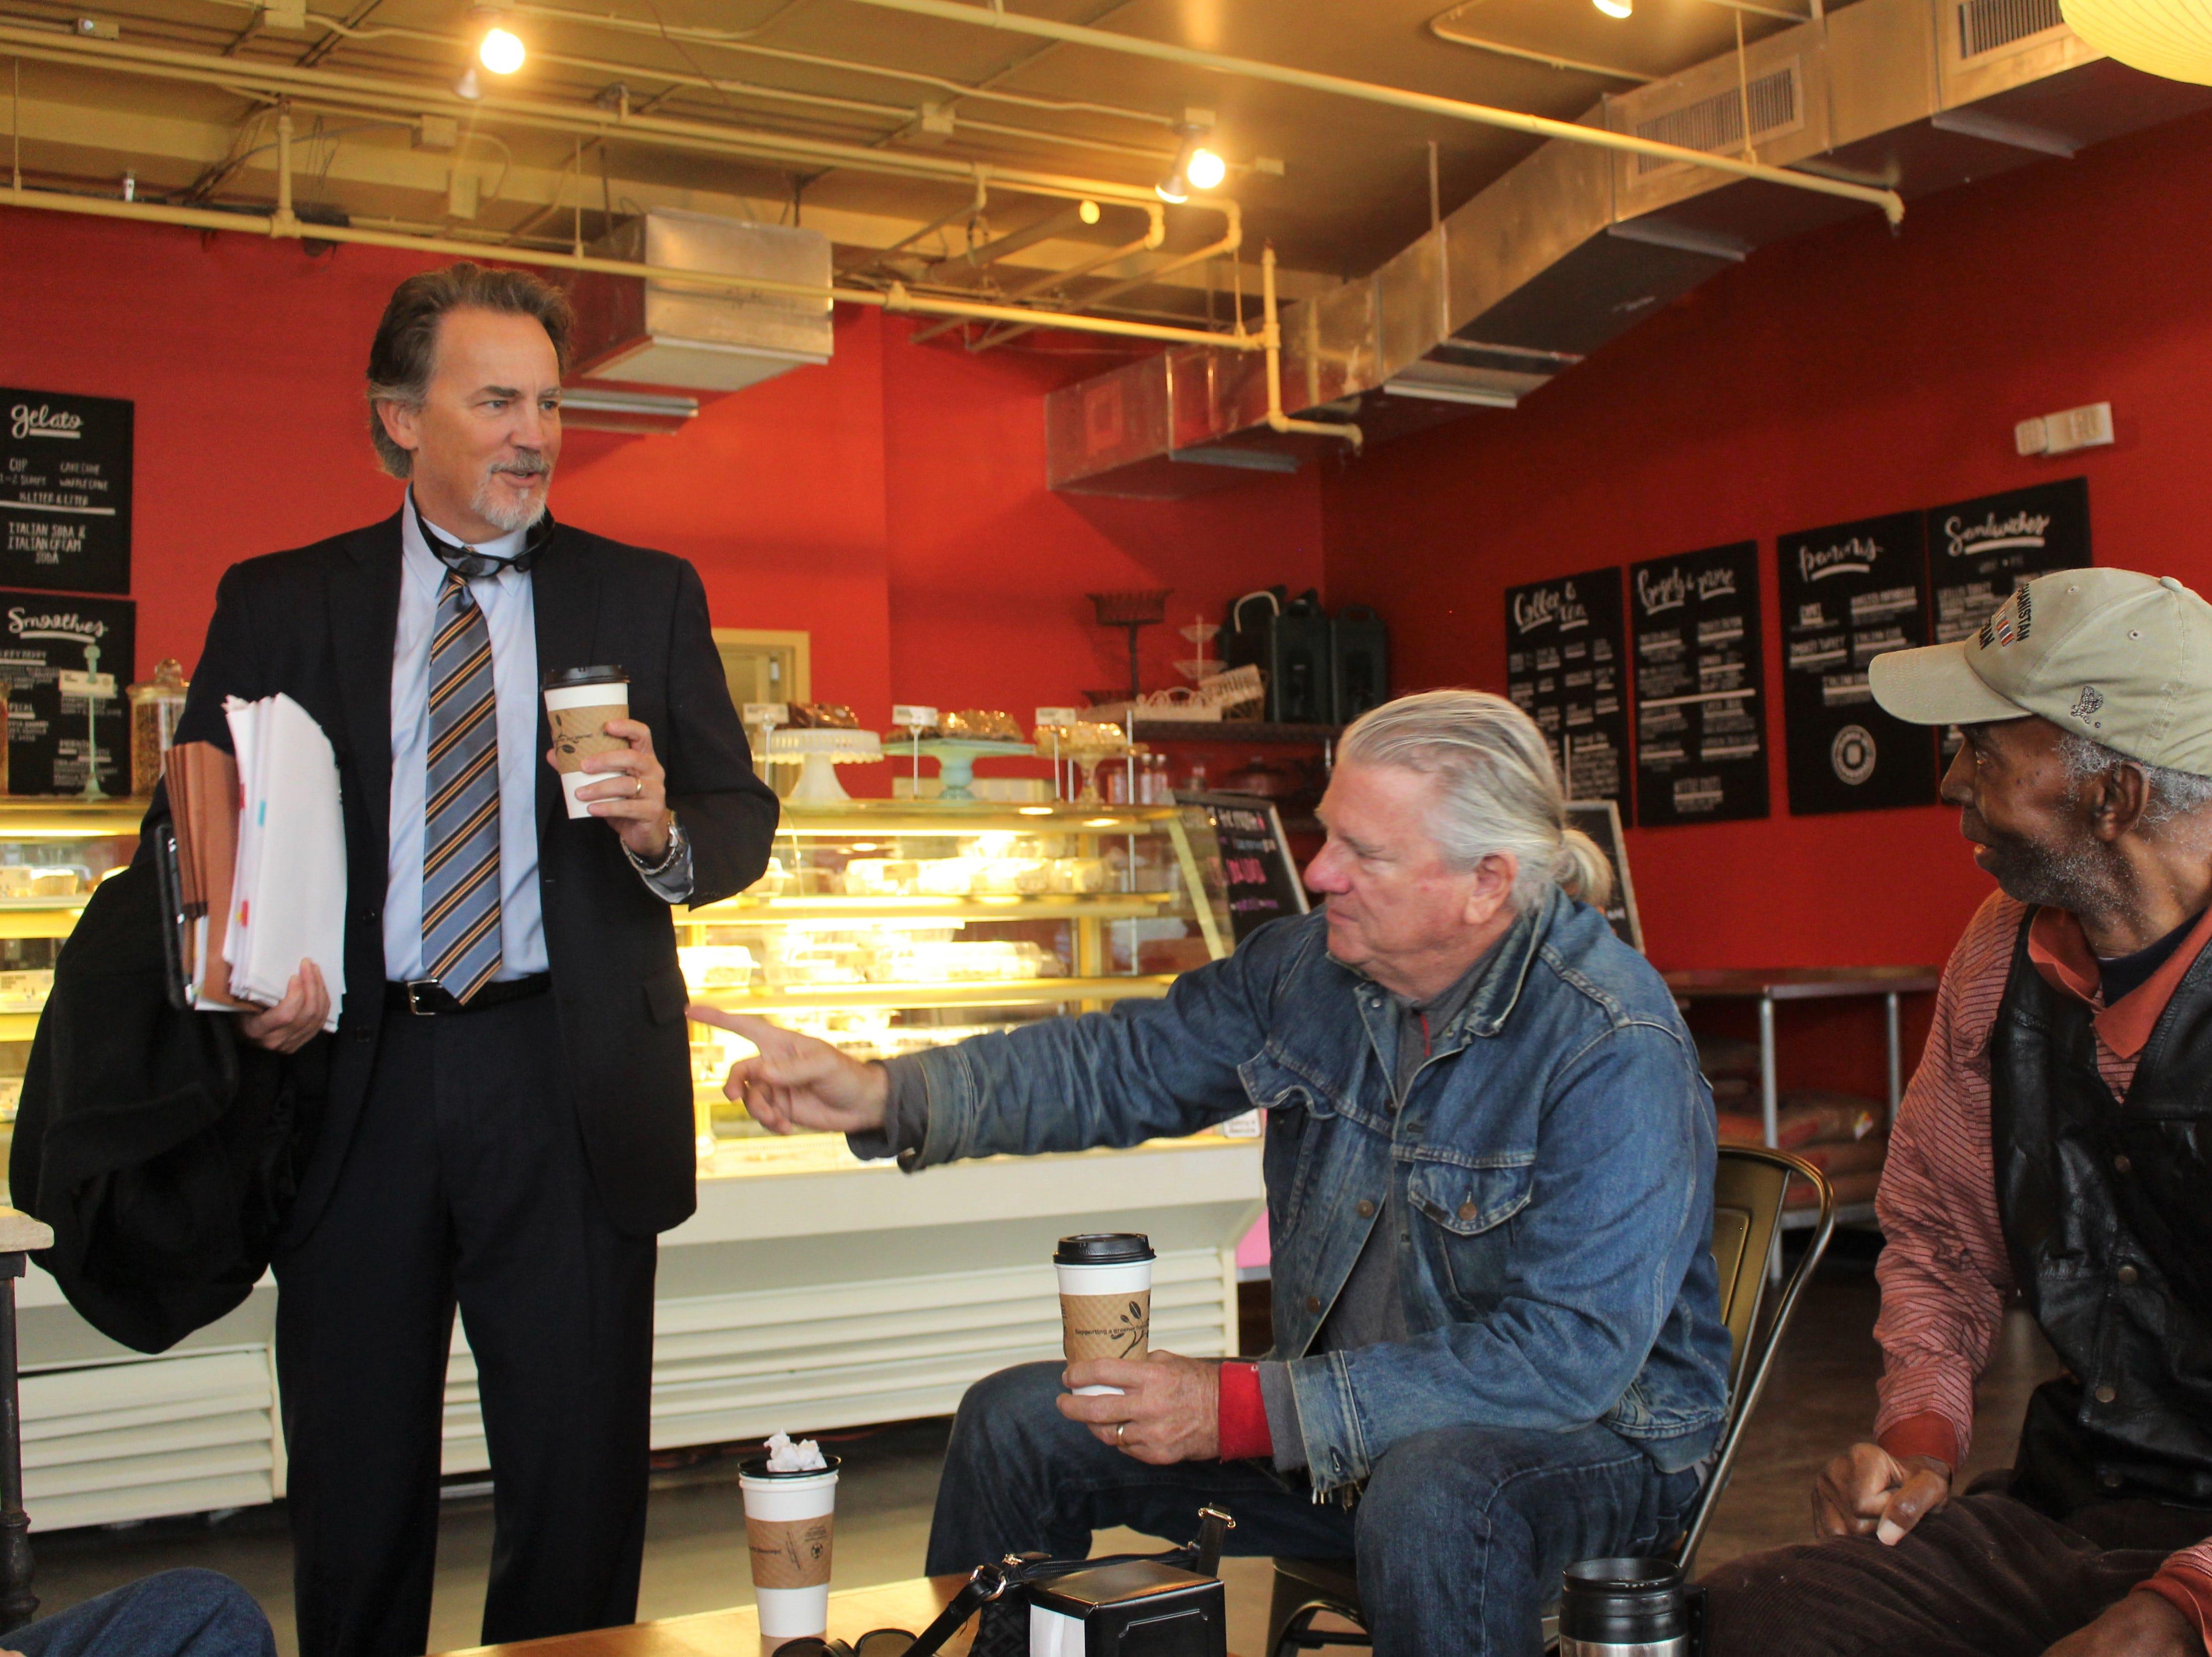 Jay Hinton, Arnie Burris and Selma Williams talk over coffee at Cafe Louisa on Jan. 17, 2019.